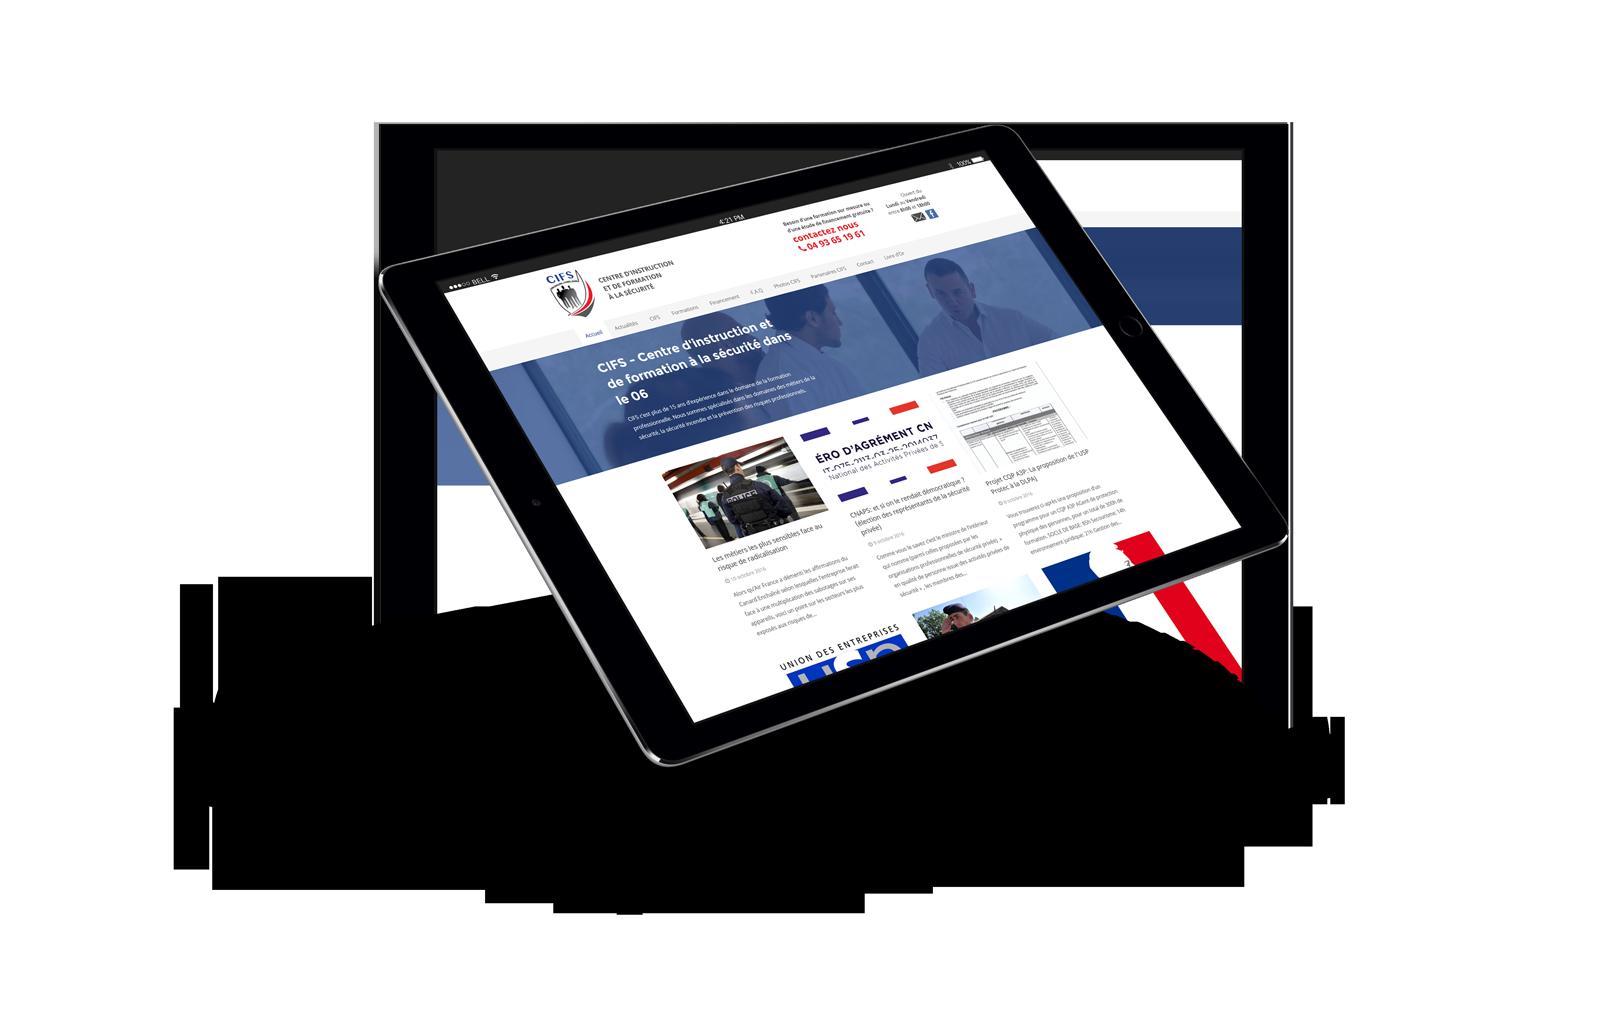 iPad Air 2 Mockup - CIFS